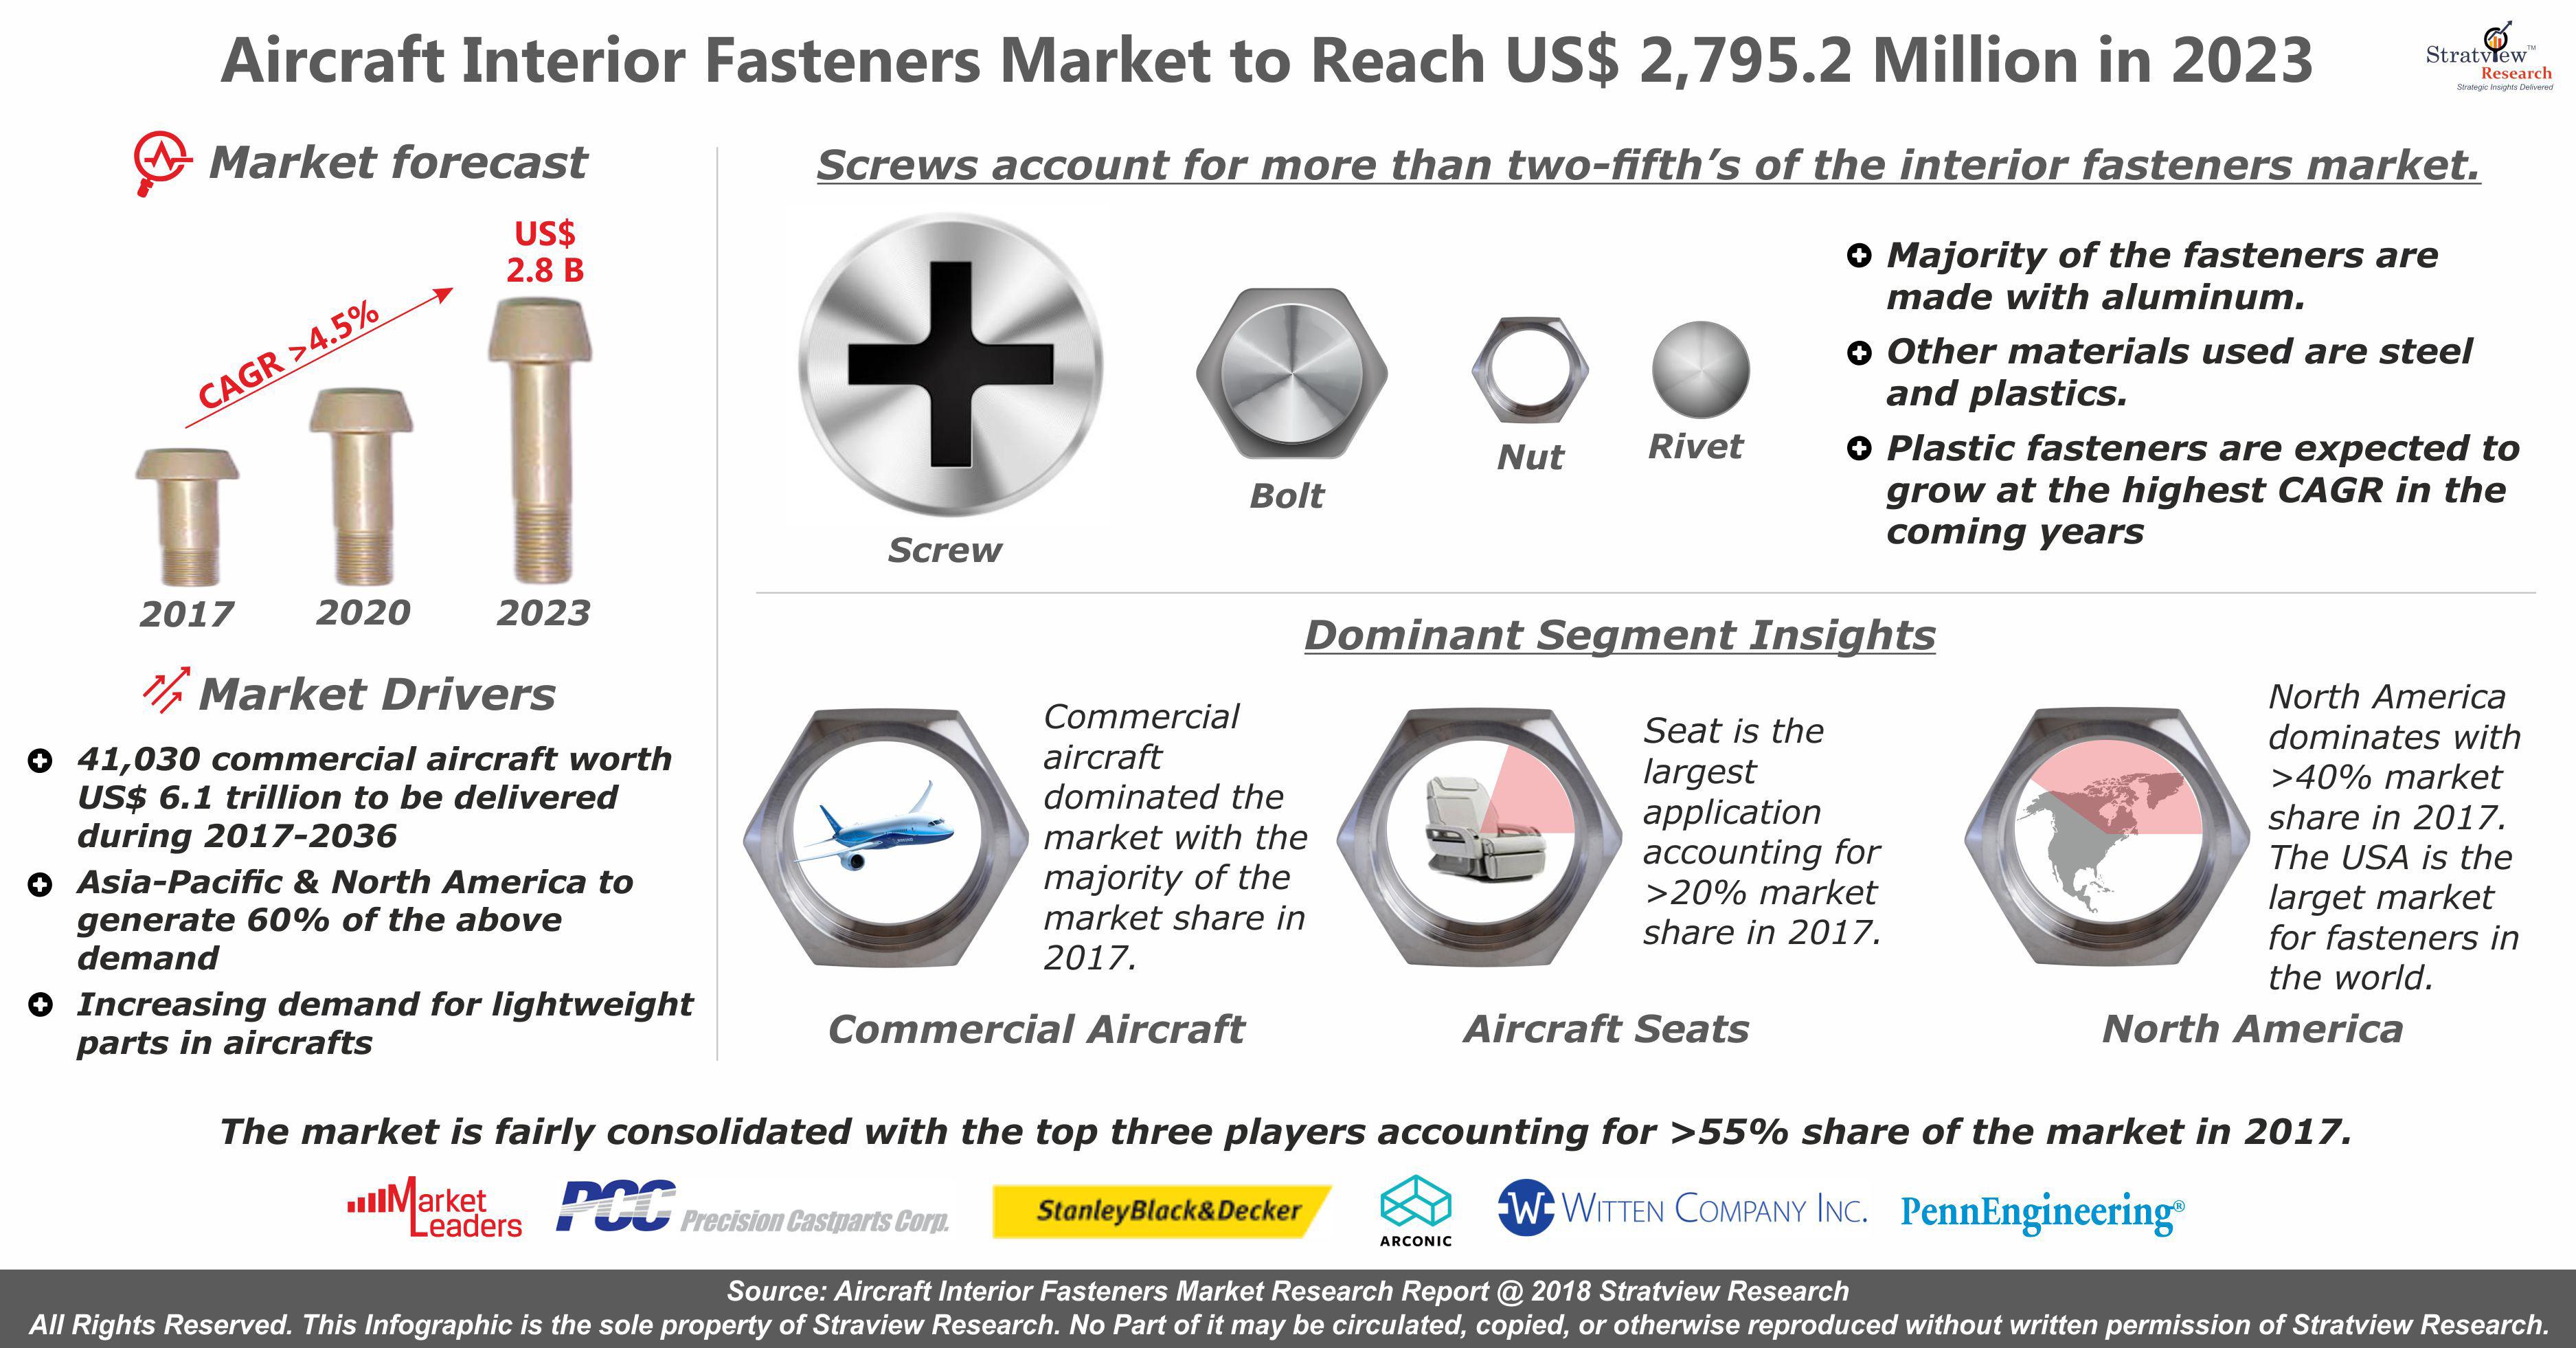 Aircraft Interior Fasteners Market